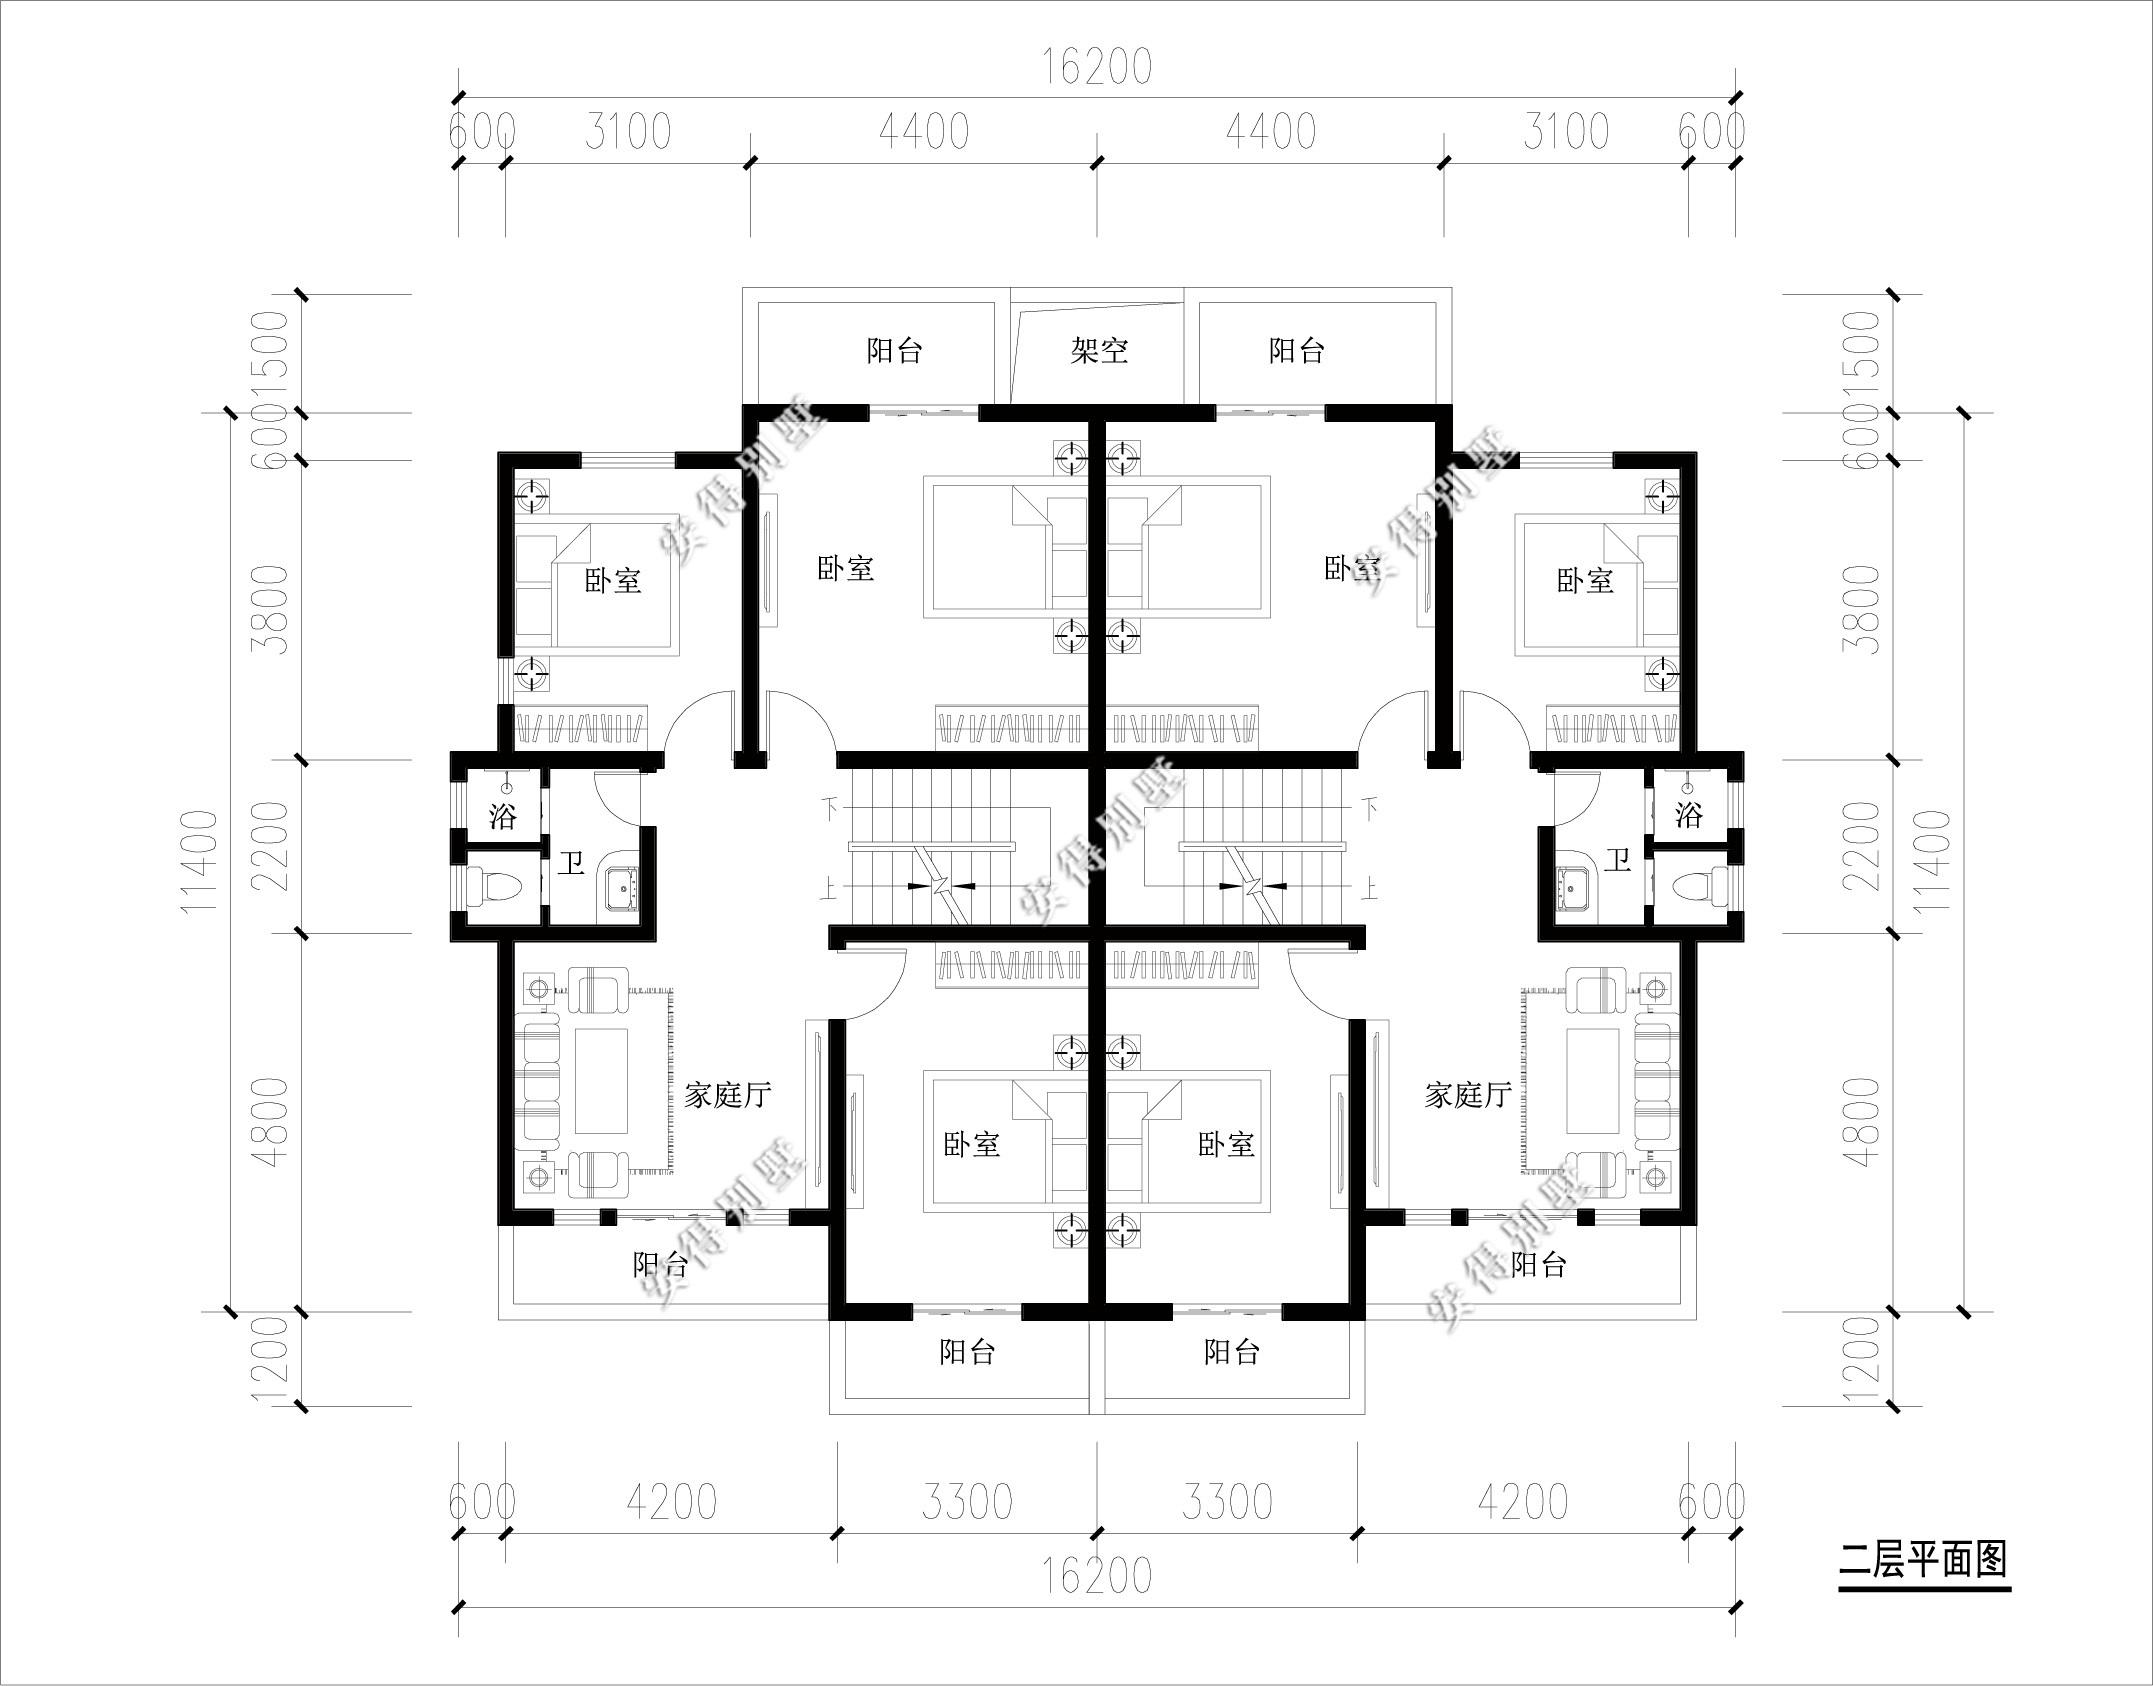 10x11米自建套房图纸